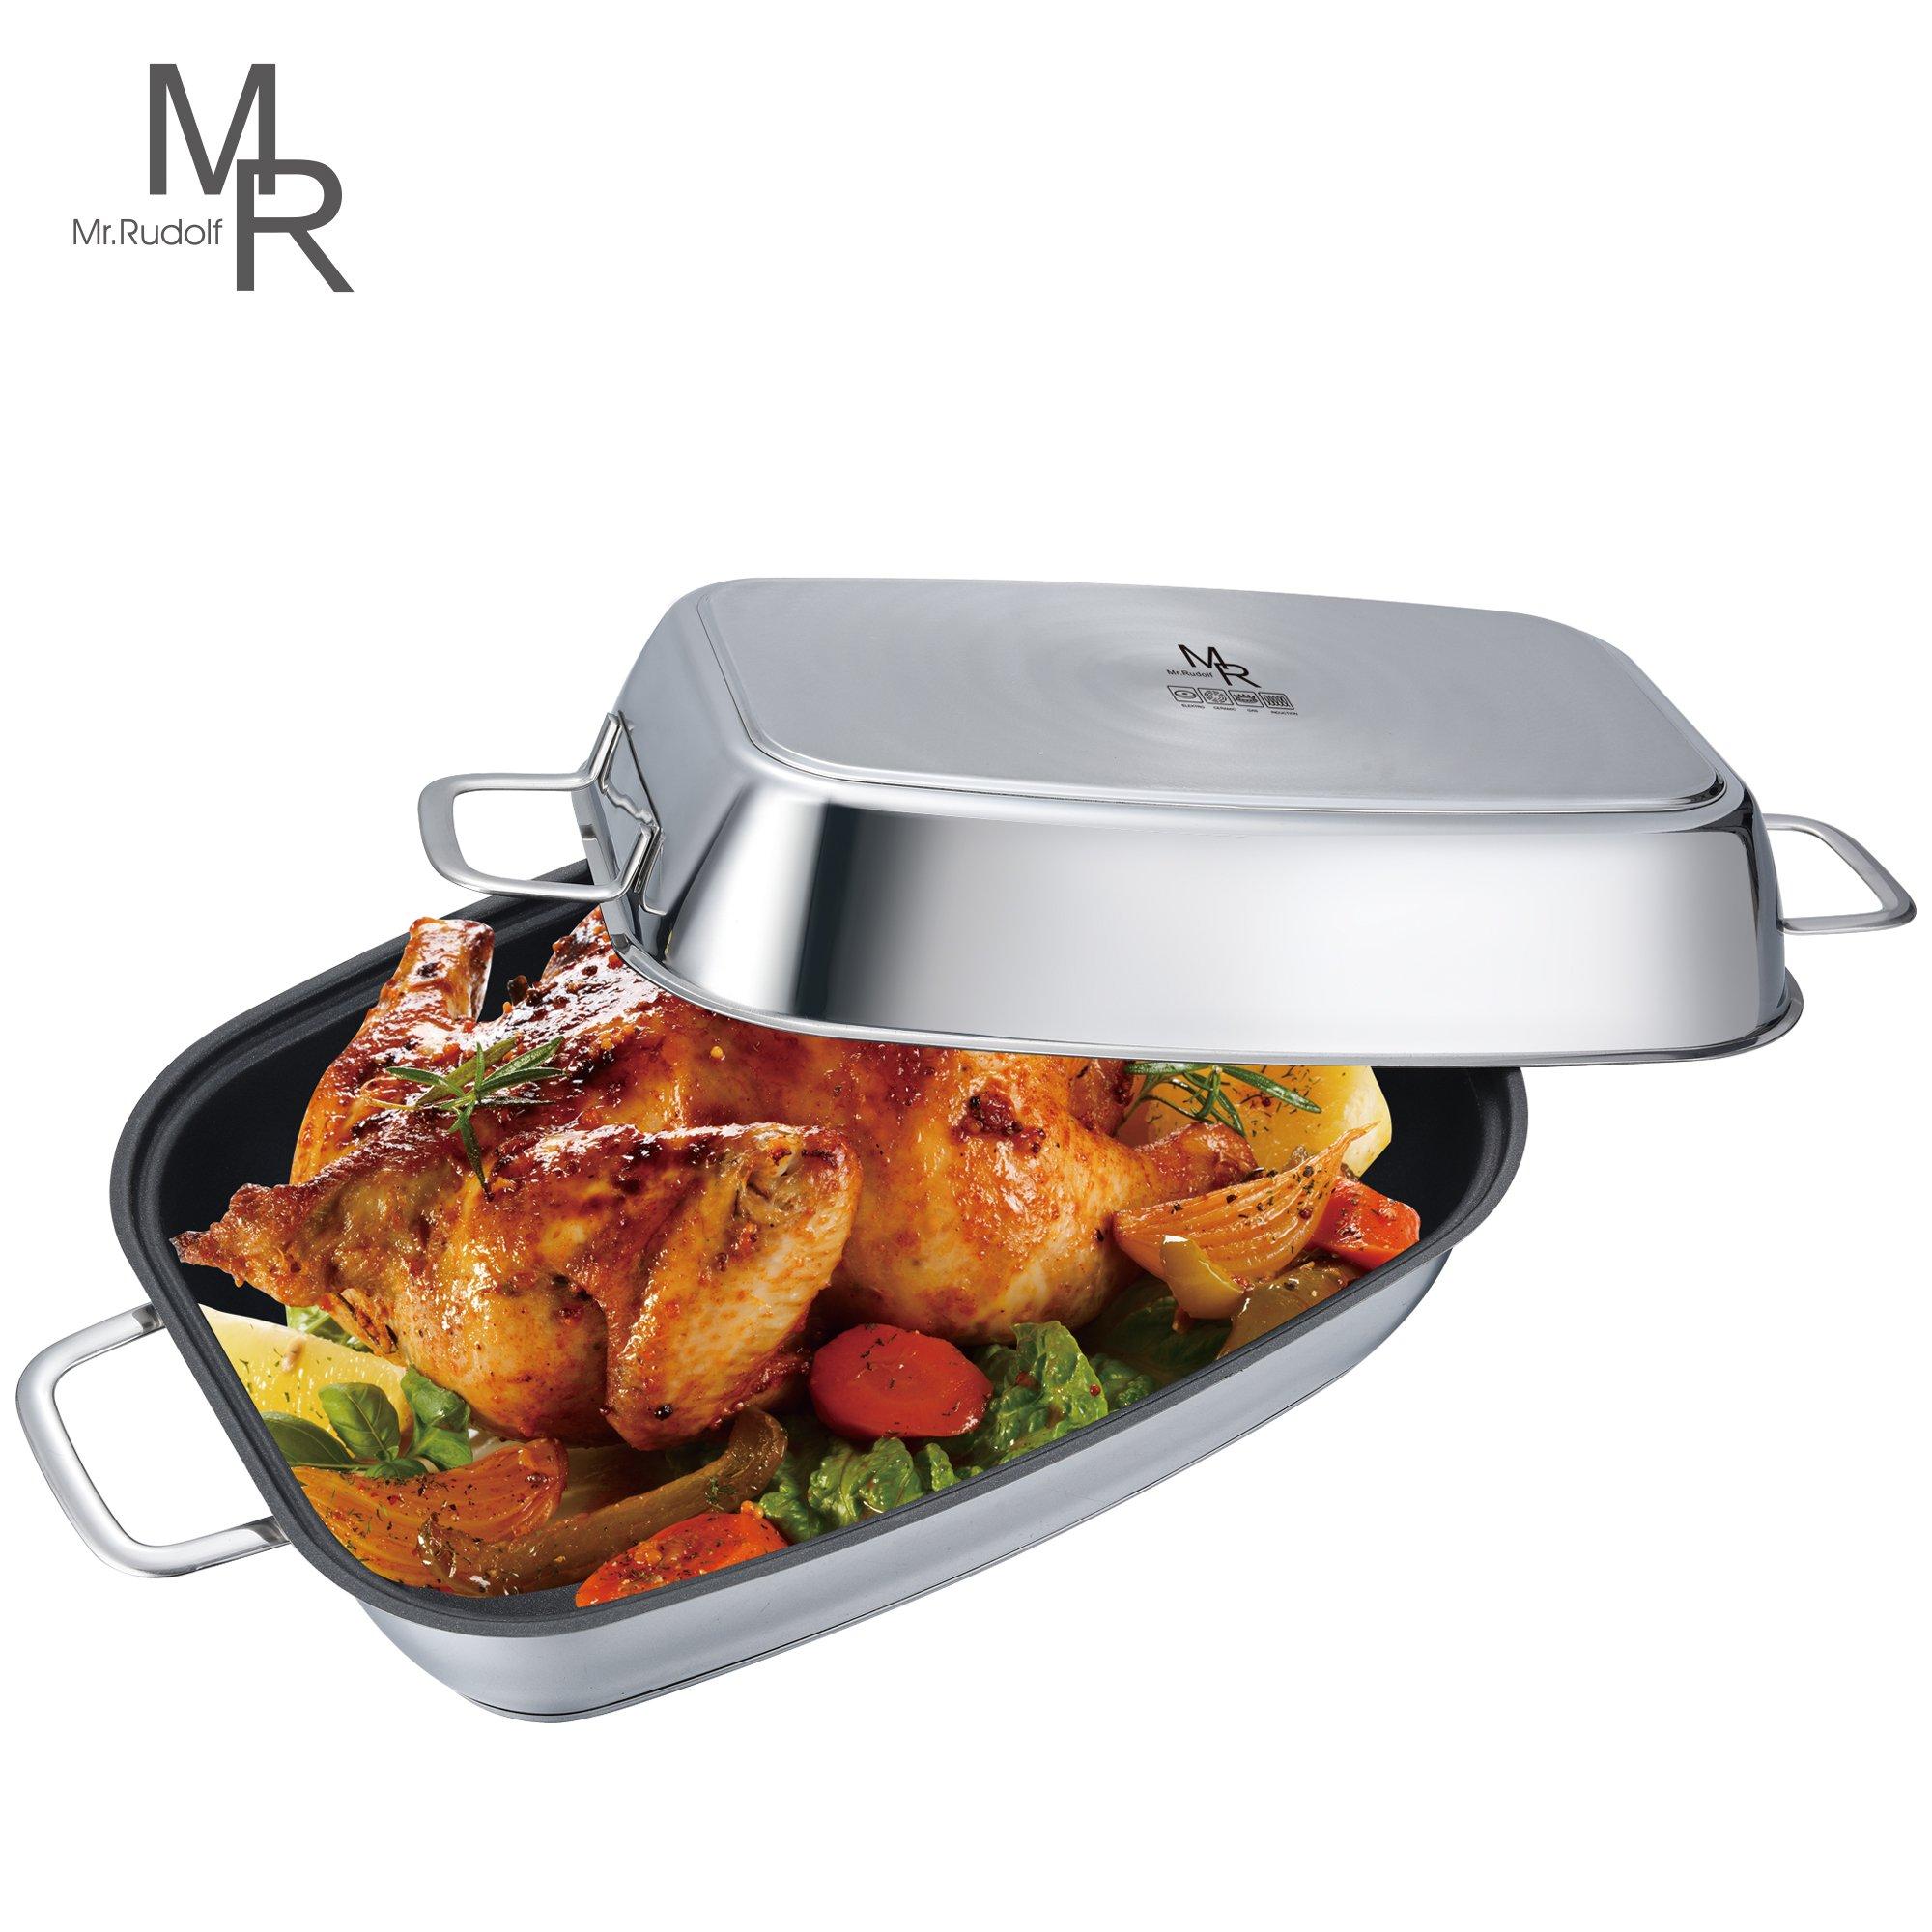 Mr. Rudolf 18/10 Stainless Steel Nonstick 14-inch Rectangular Roaster with Lid Dishwasher Safe Oven Safe Rectangular Roasting Pan PFOA Free 6.4 Quart + 4.2 Quart